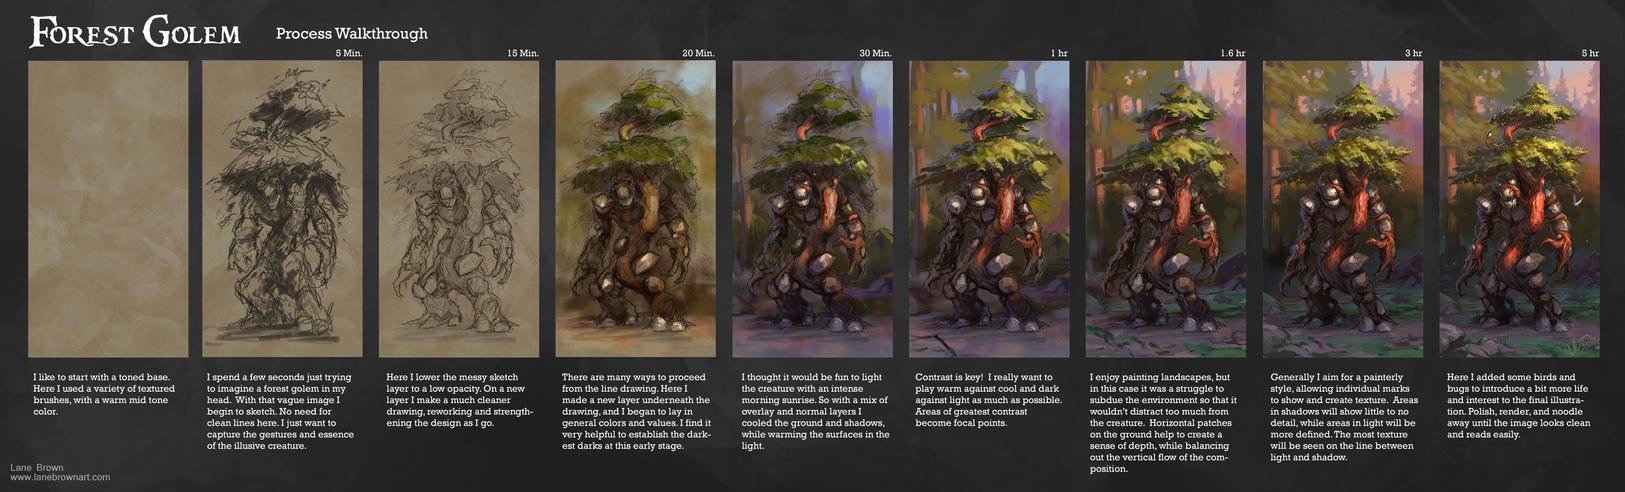 Forest Golem Process Walkthrough by Wildweasel339